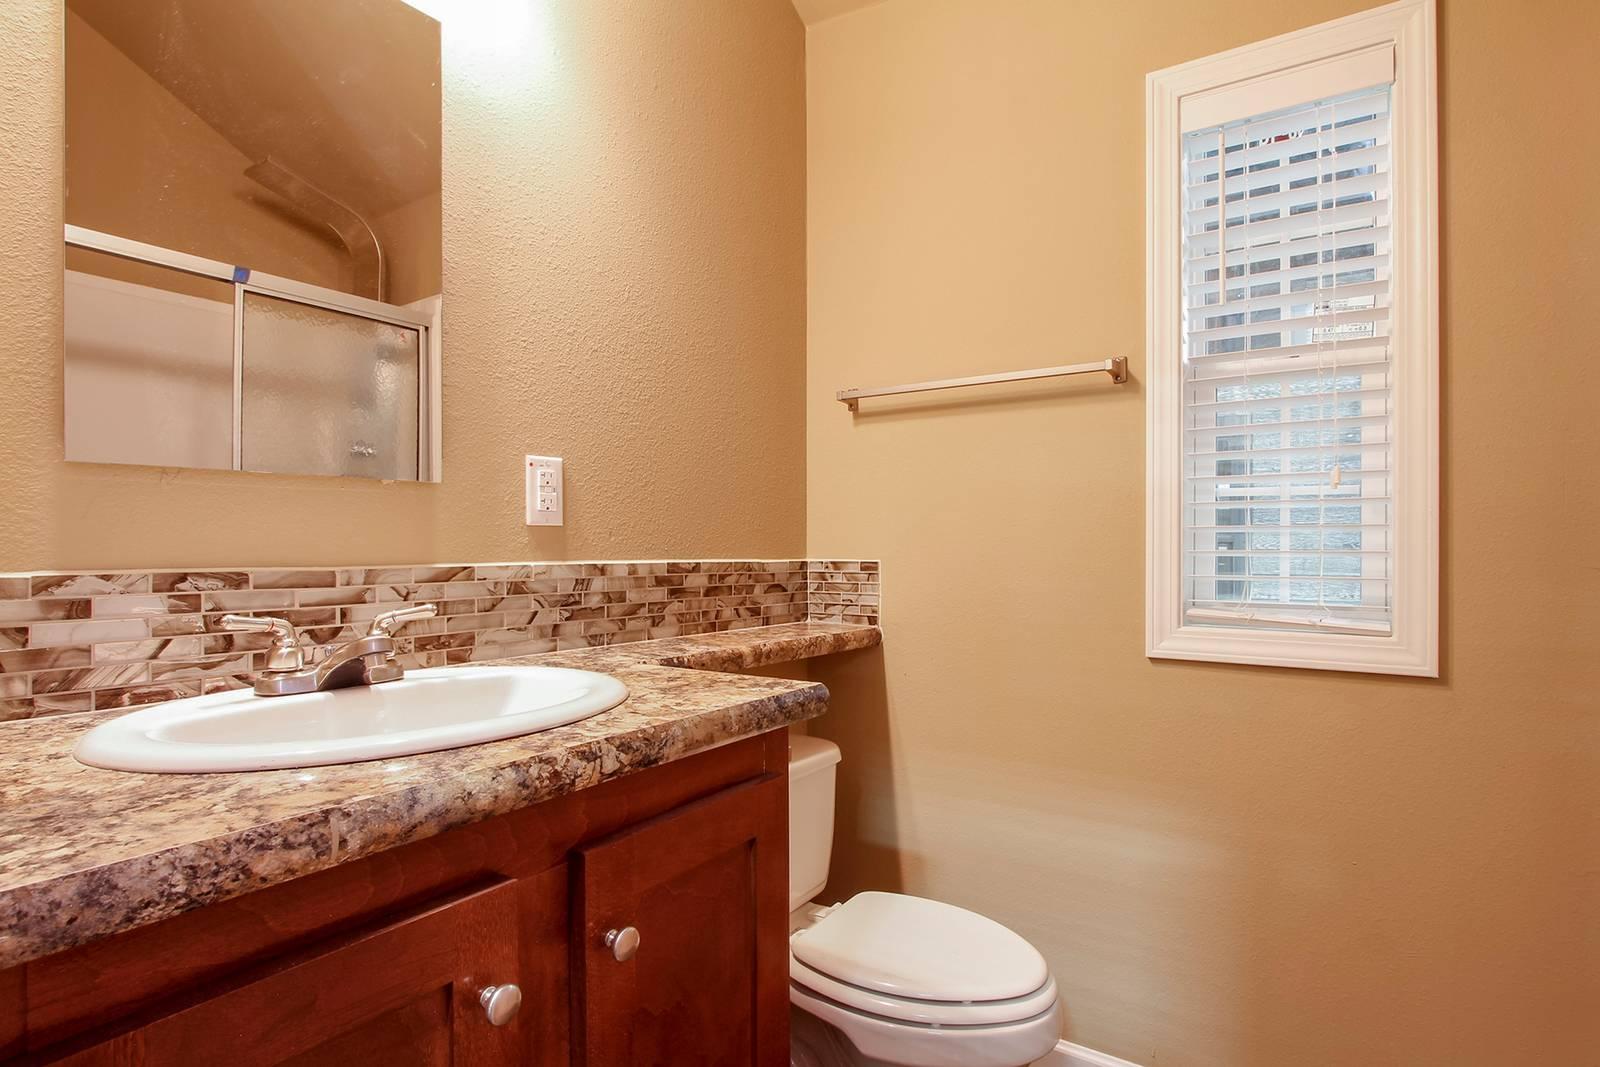 The Ibiza APH-529 Bathroom